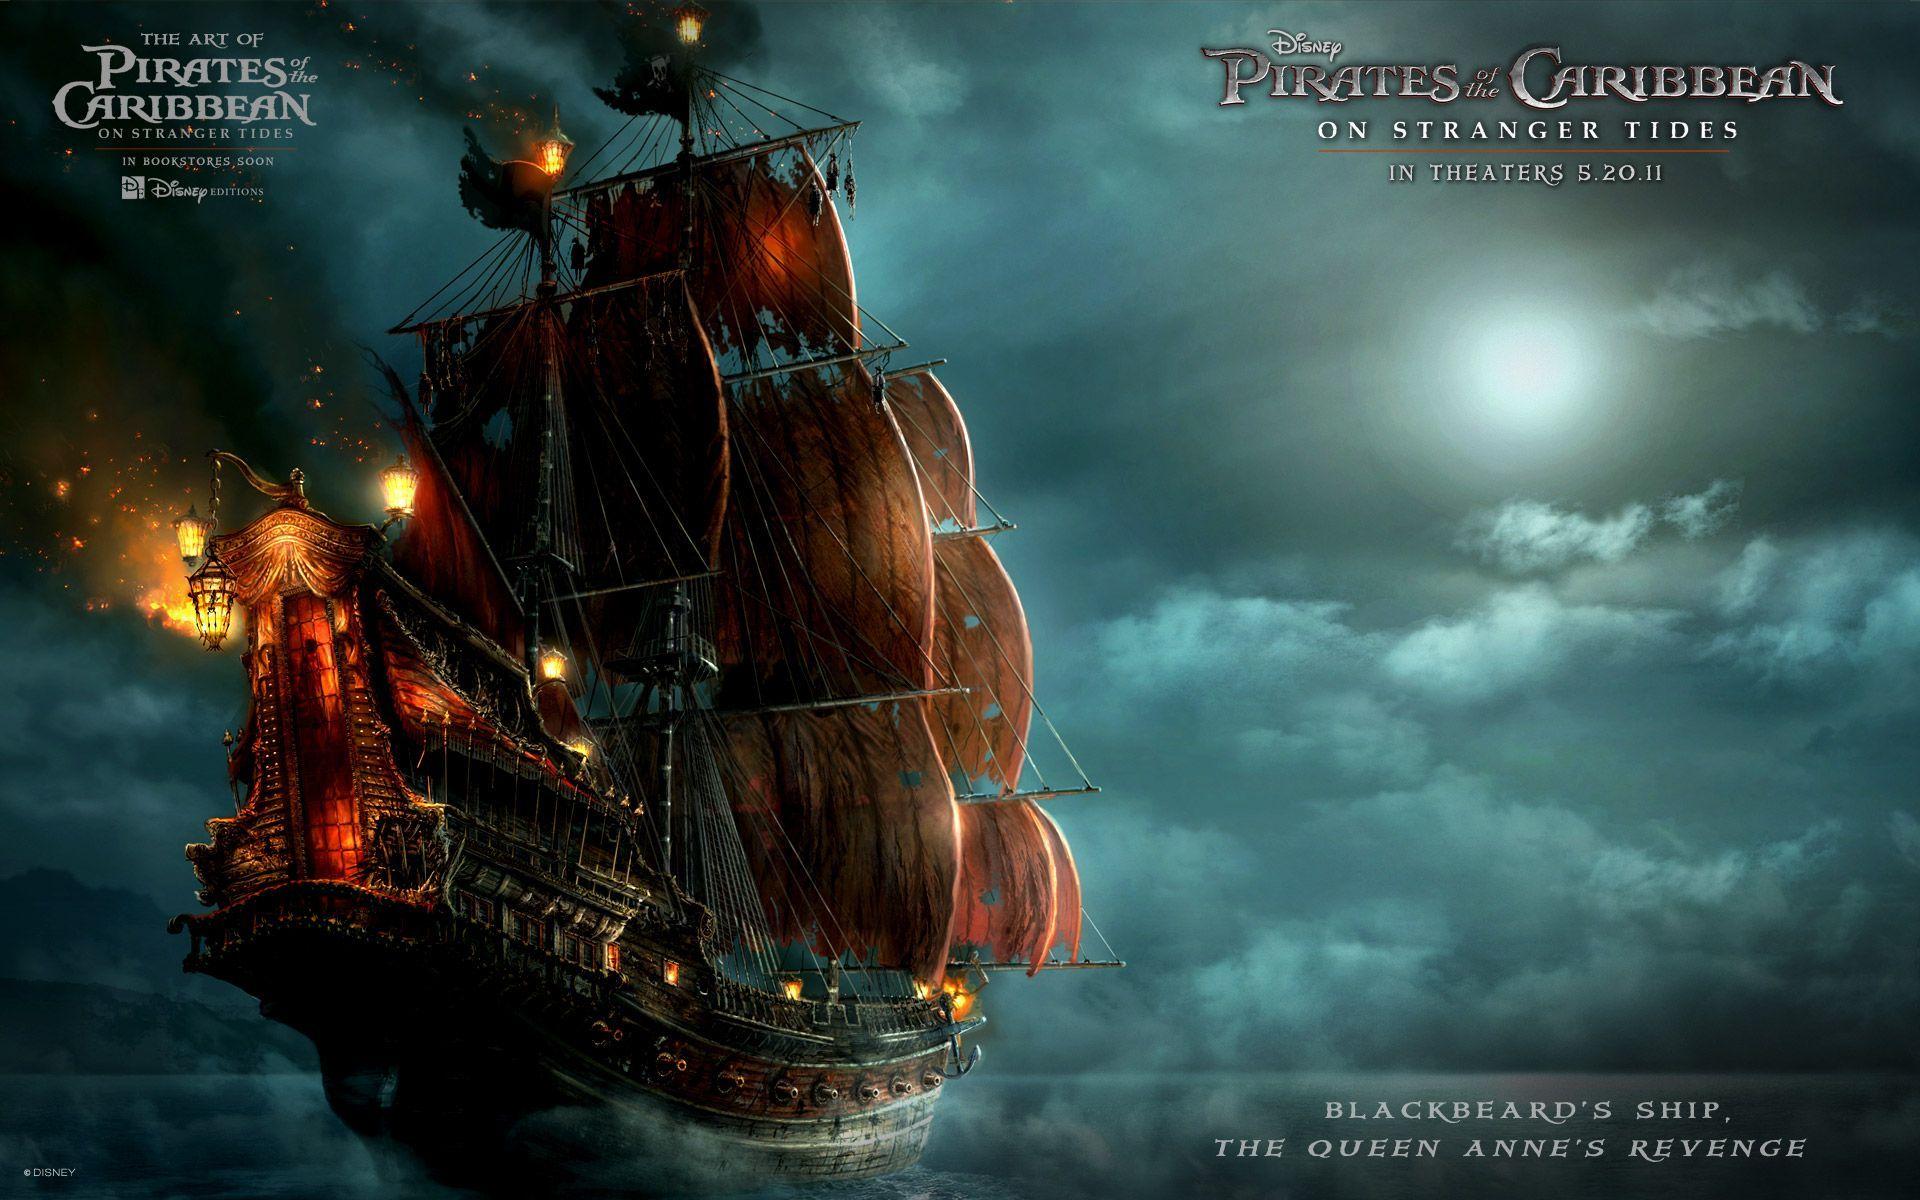 Pirates Of The Caribbean clipart pirate ship HD  Wallpaper Blackbeard's in